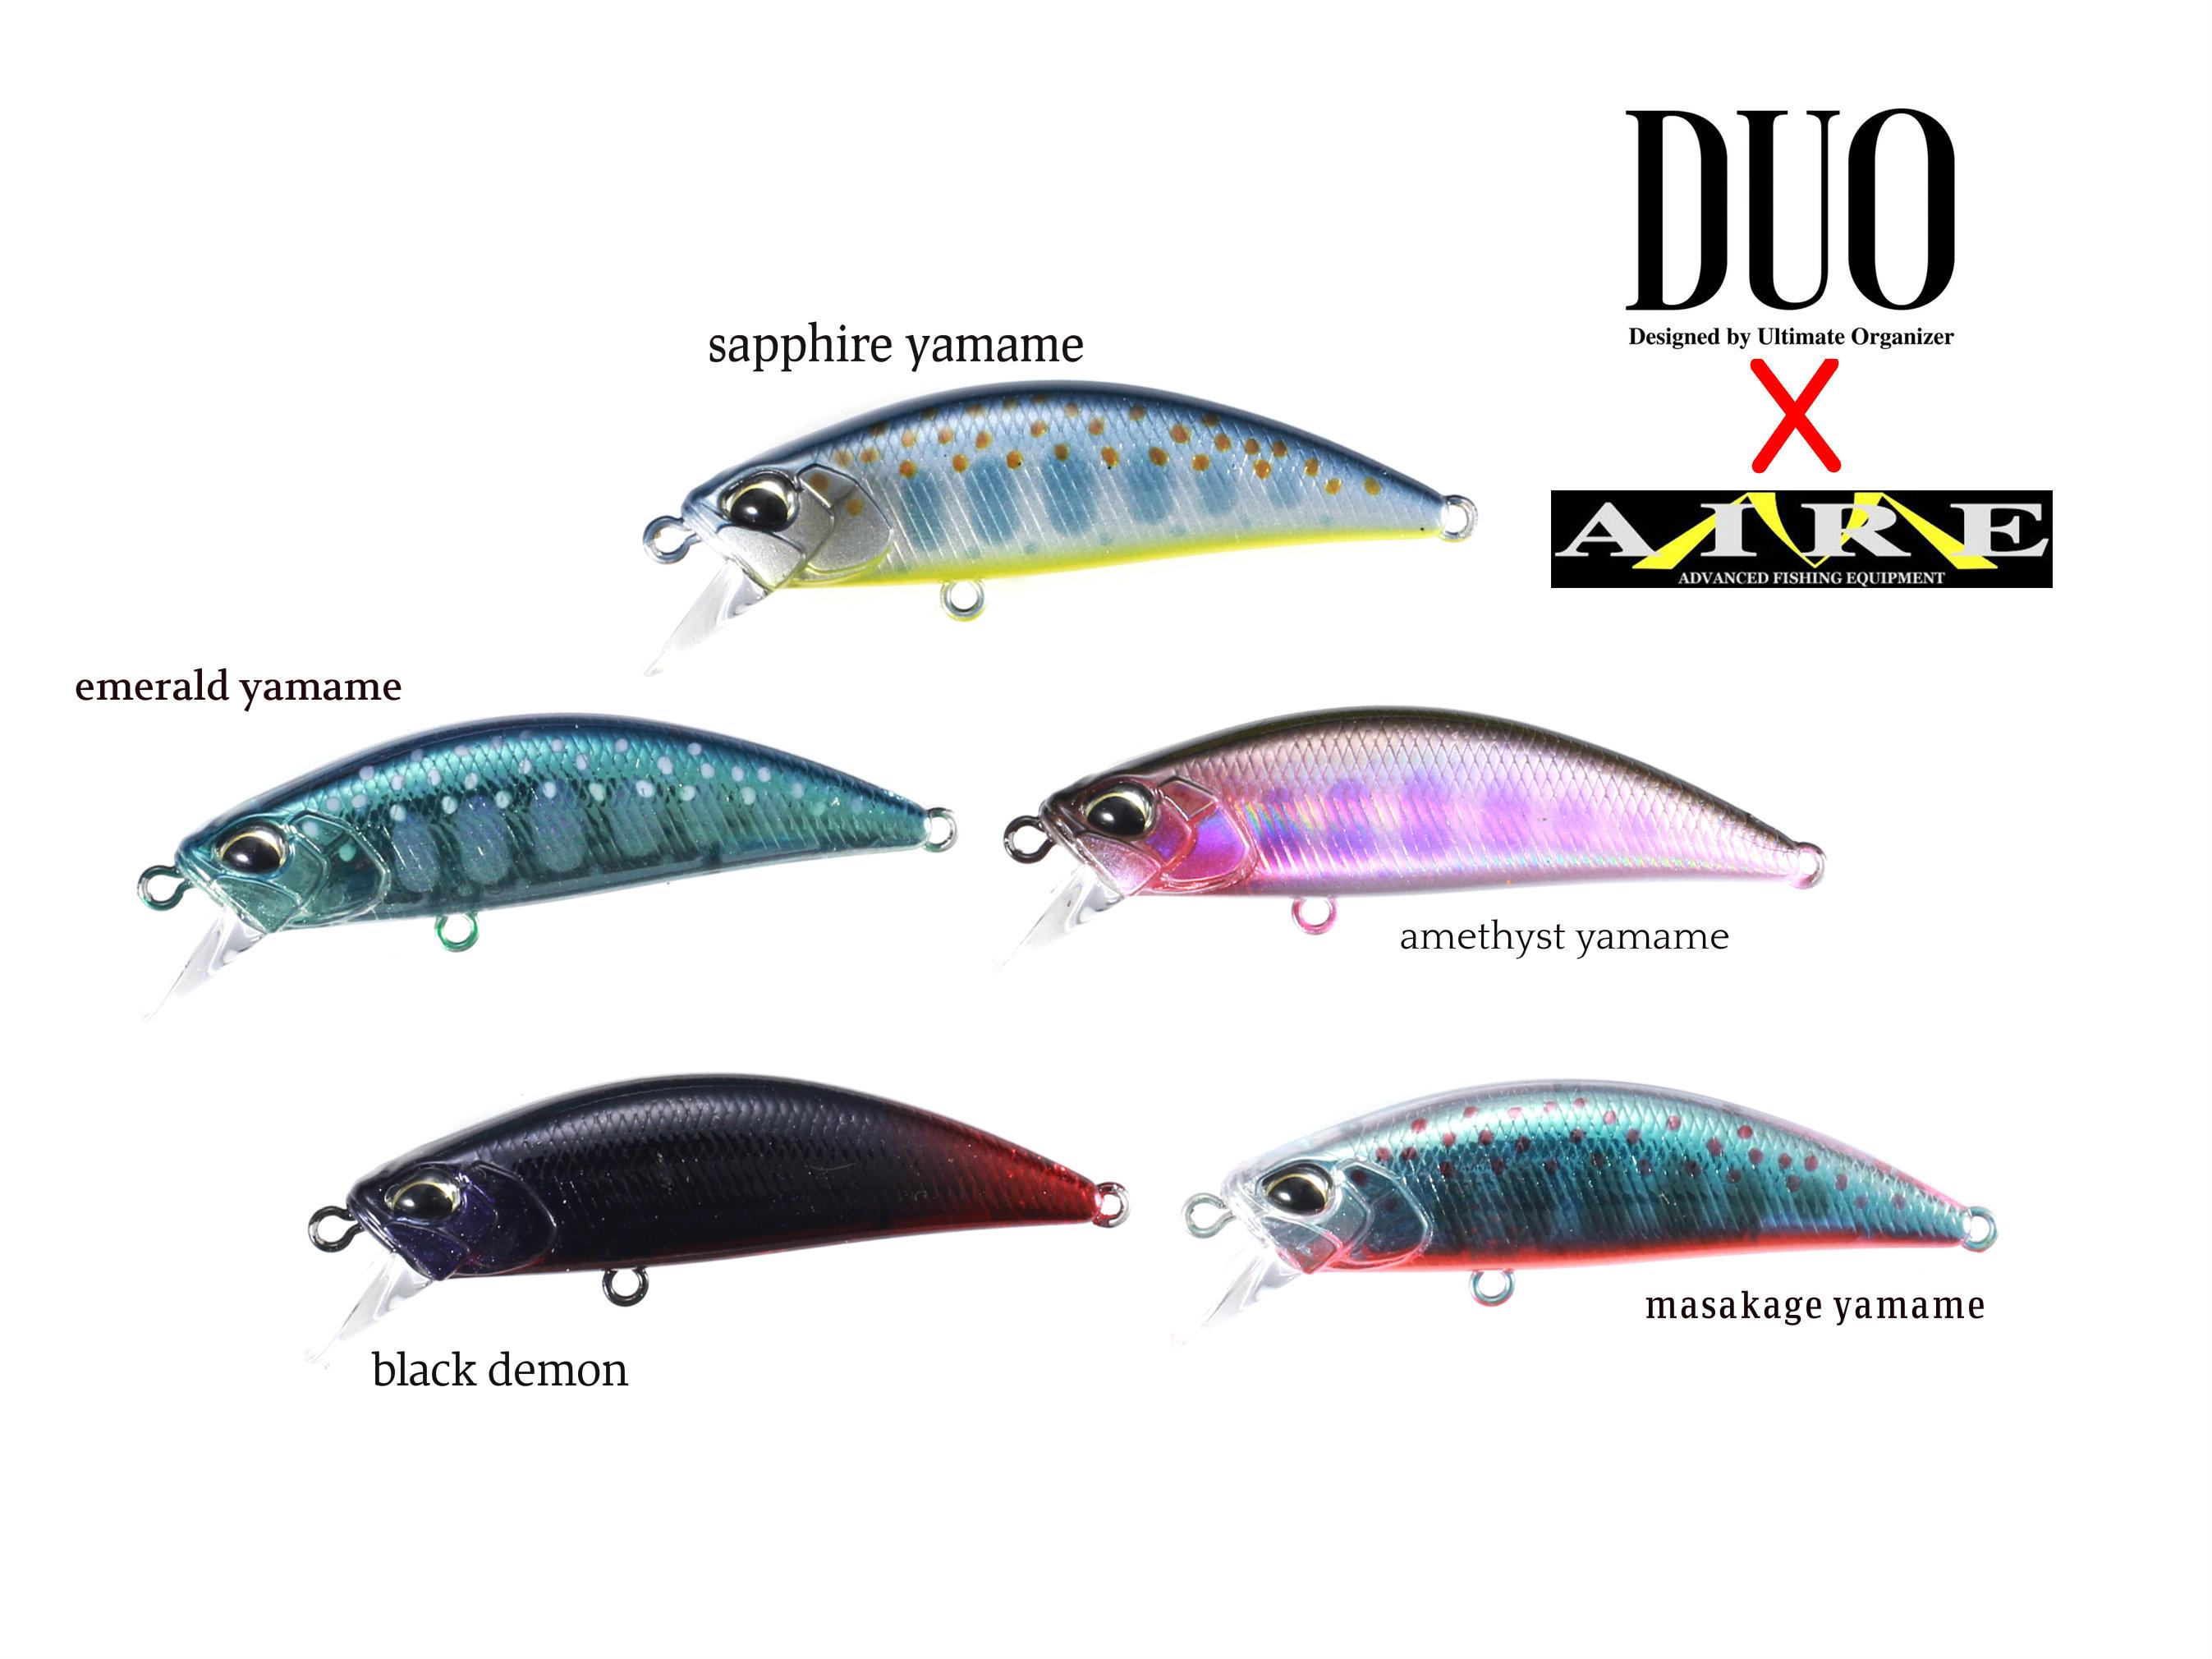 DUO Spearhead Ryuki 70 MDF 7cm 5,4g Fishing Lures Choice of Colors